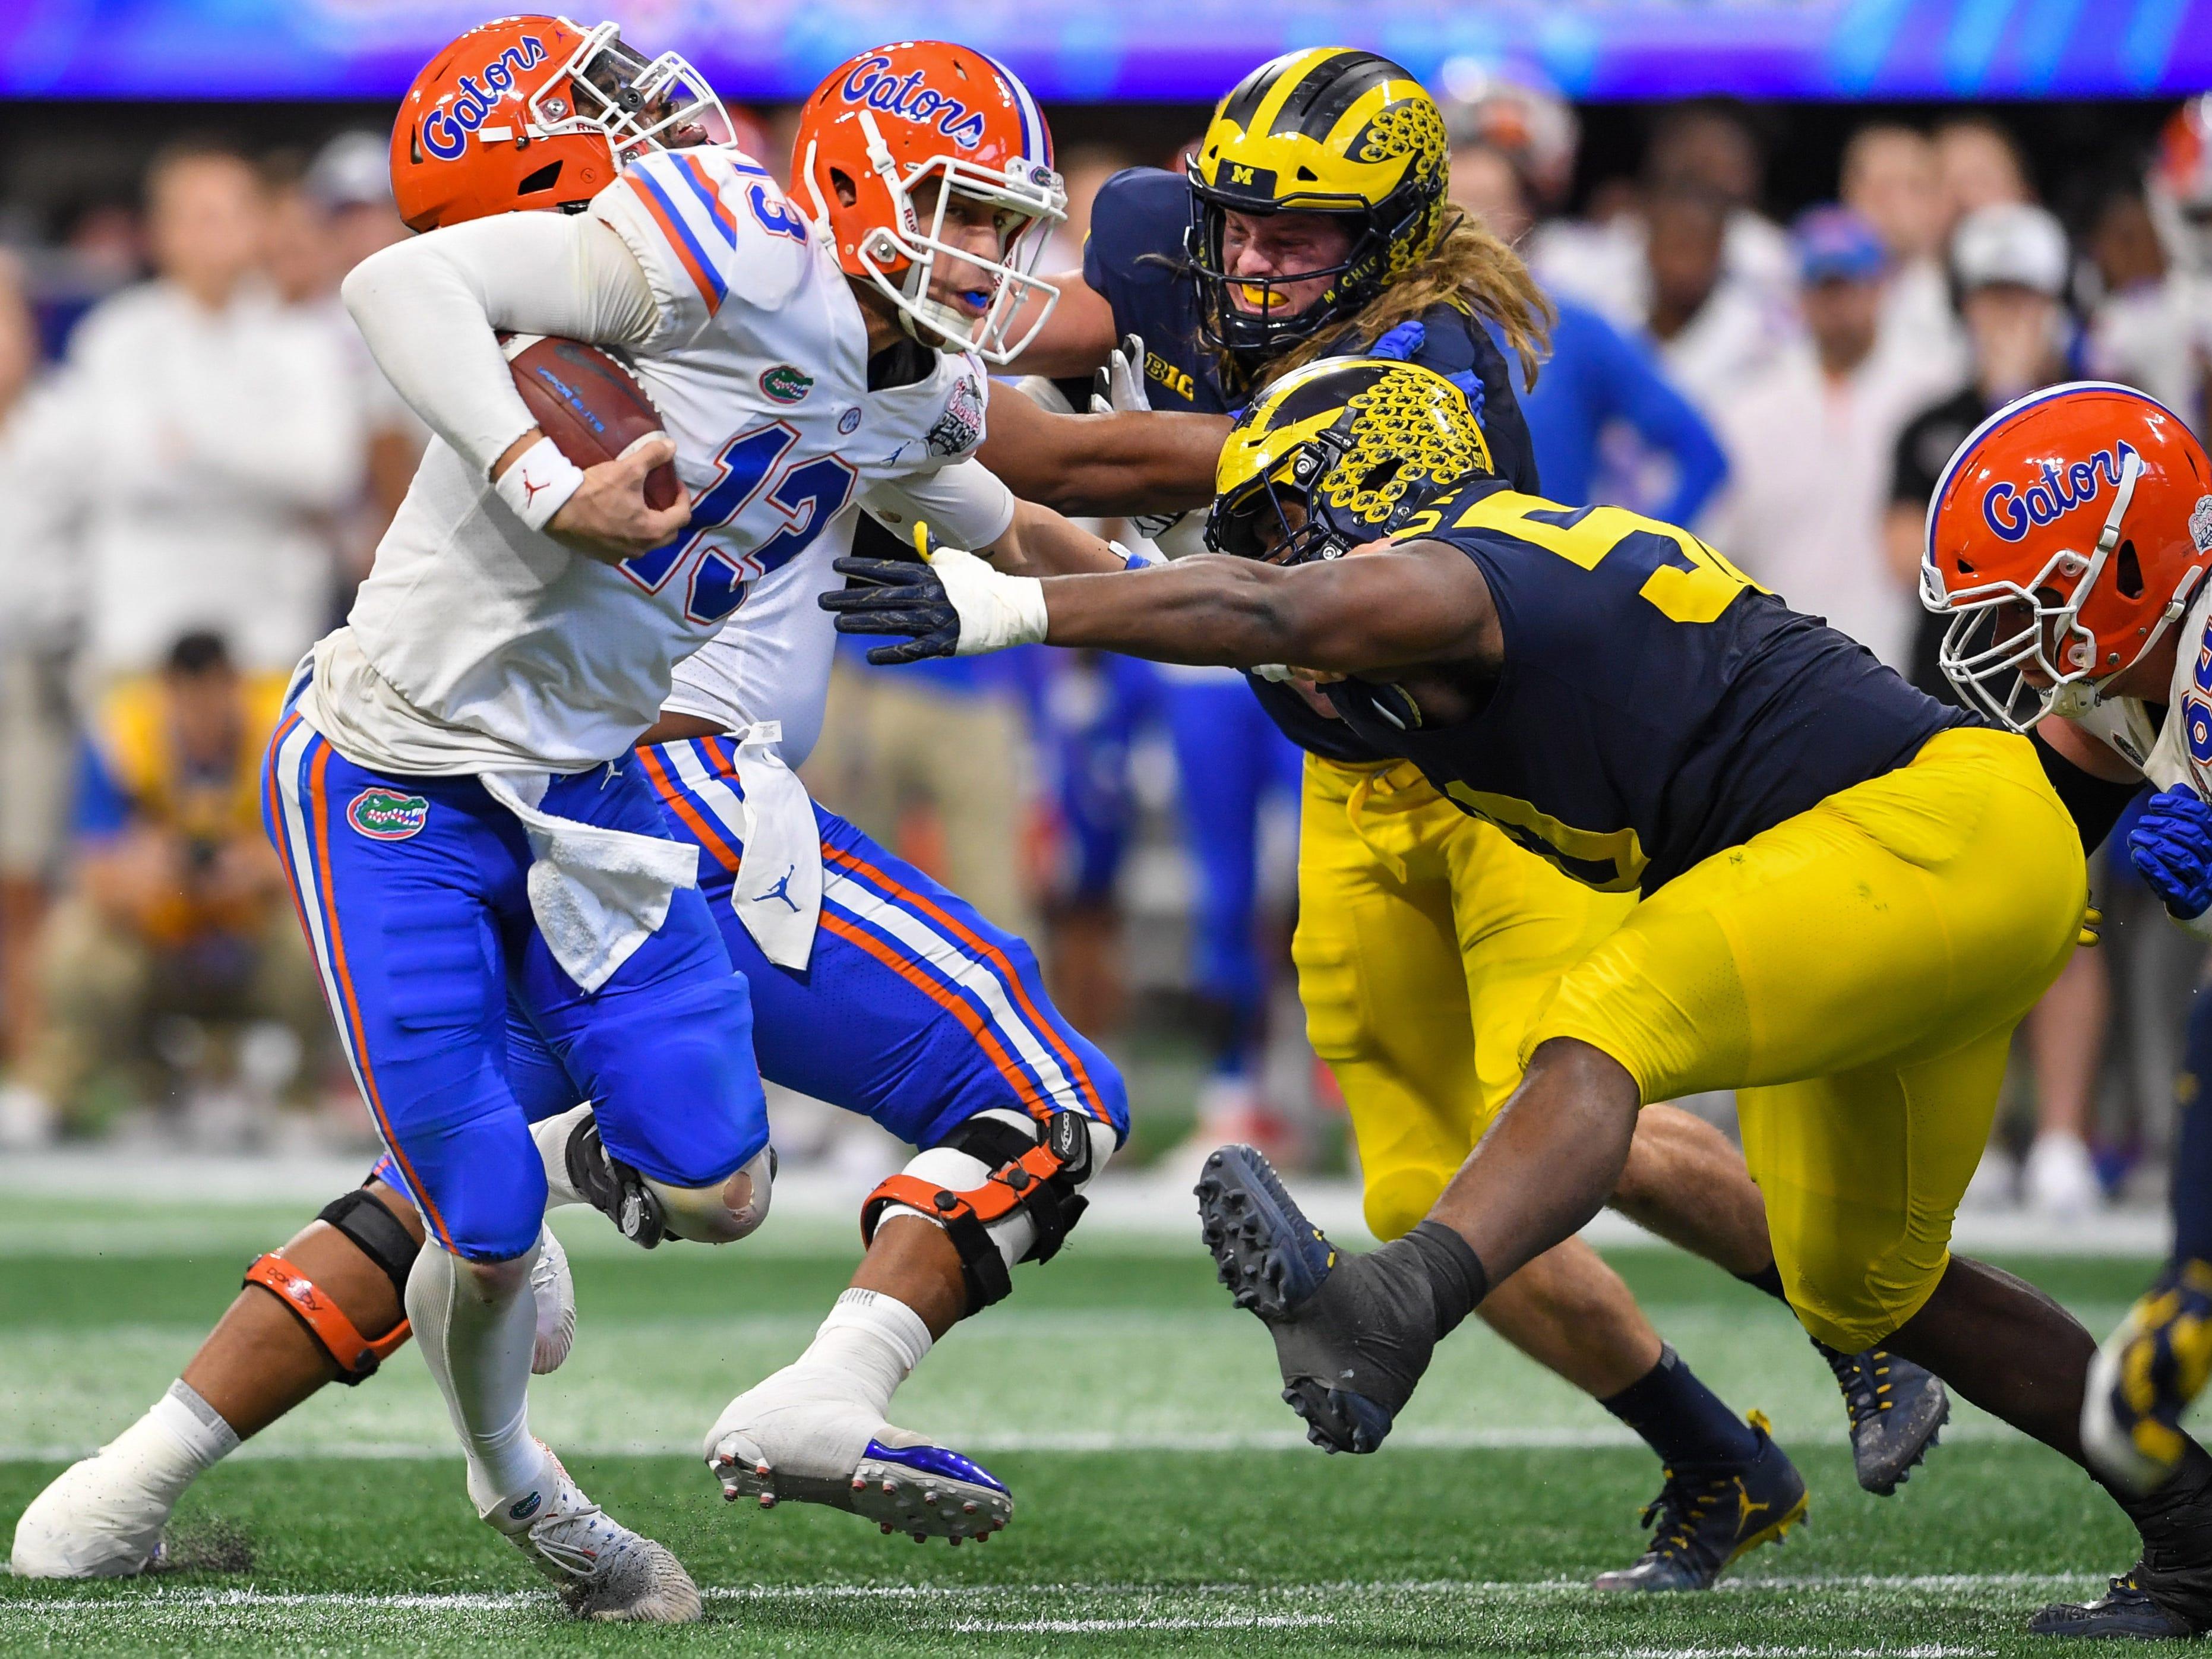 Florida quarterback Feleipe Franks runs against Michigan in the first half in the 2018 Peach Bowl at Mercedes-Benz Stadium.